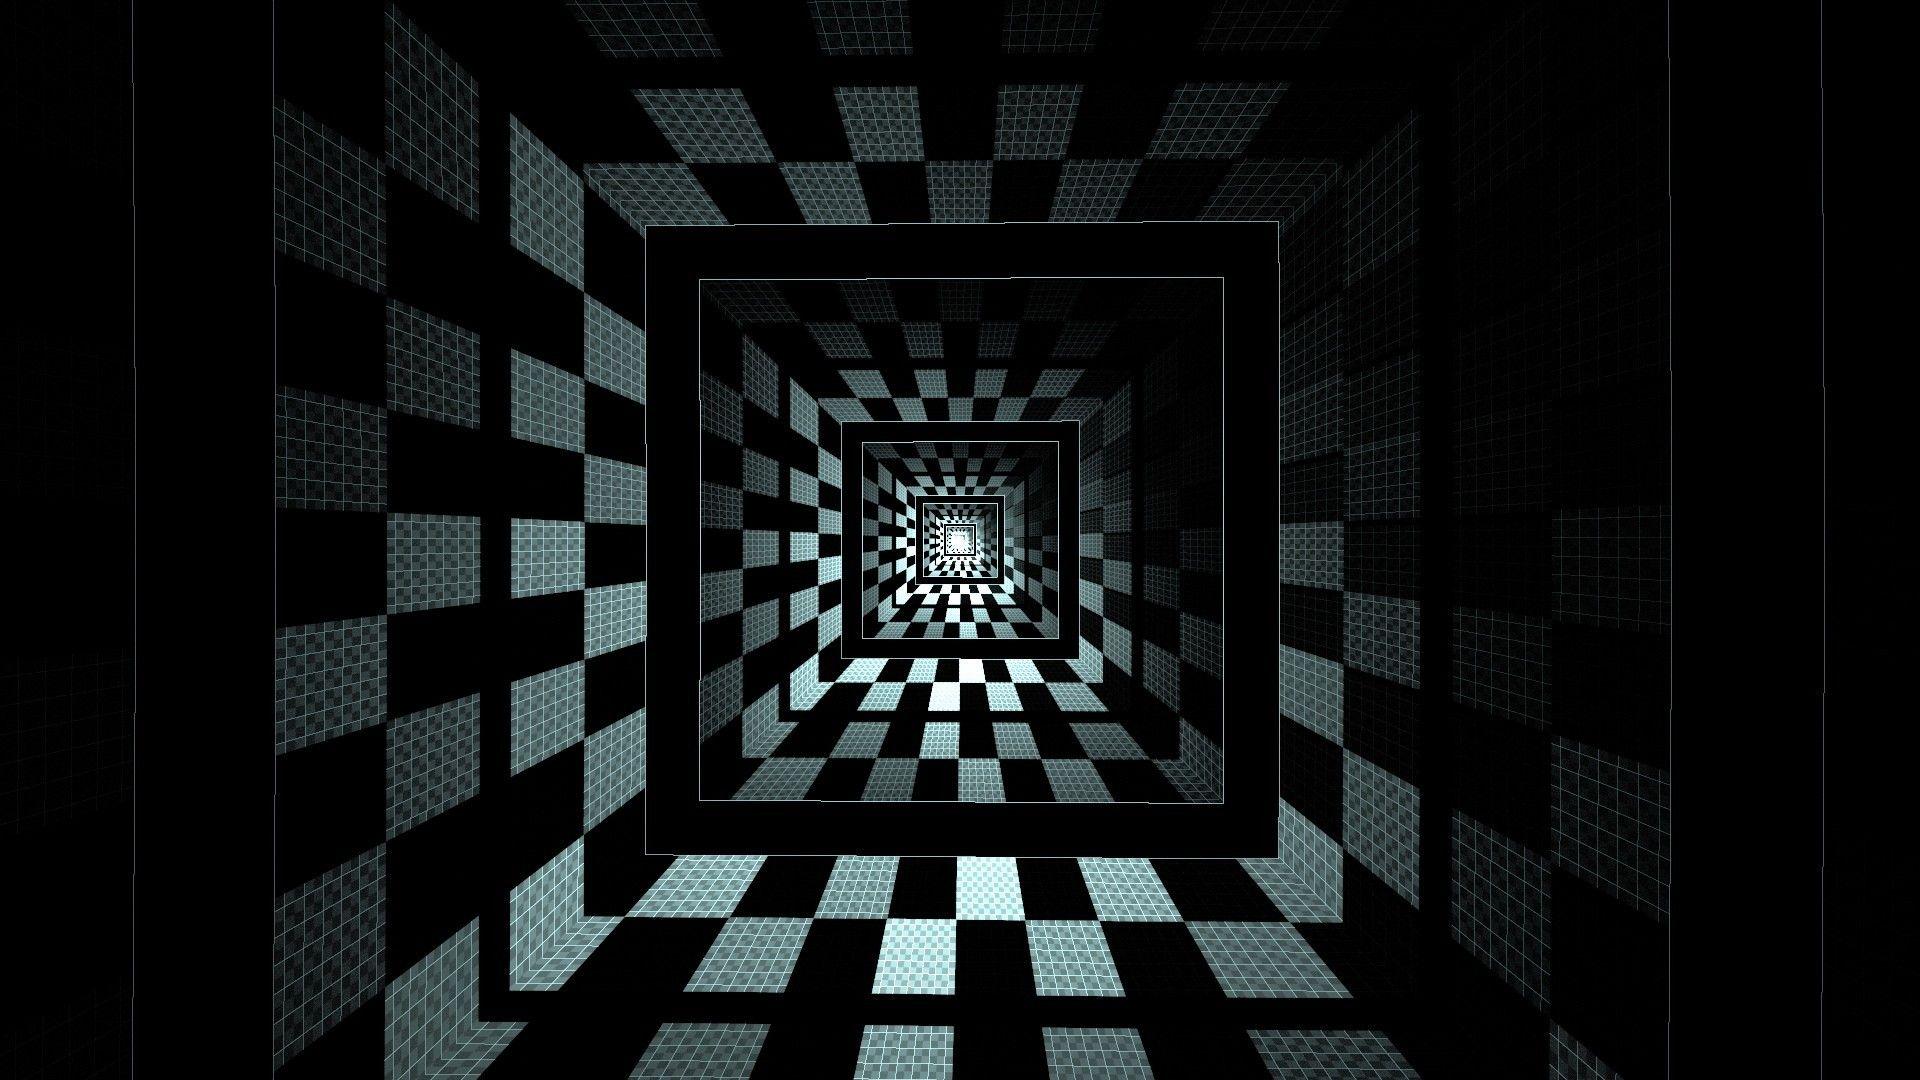 Pin on hd wallpapers - Optical illusion wallpaper hd ...